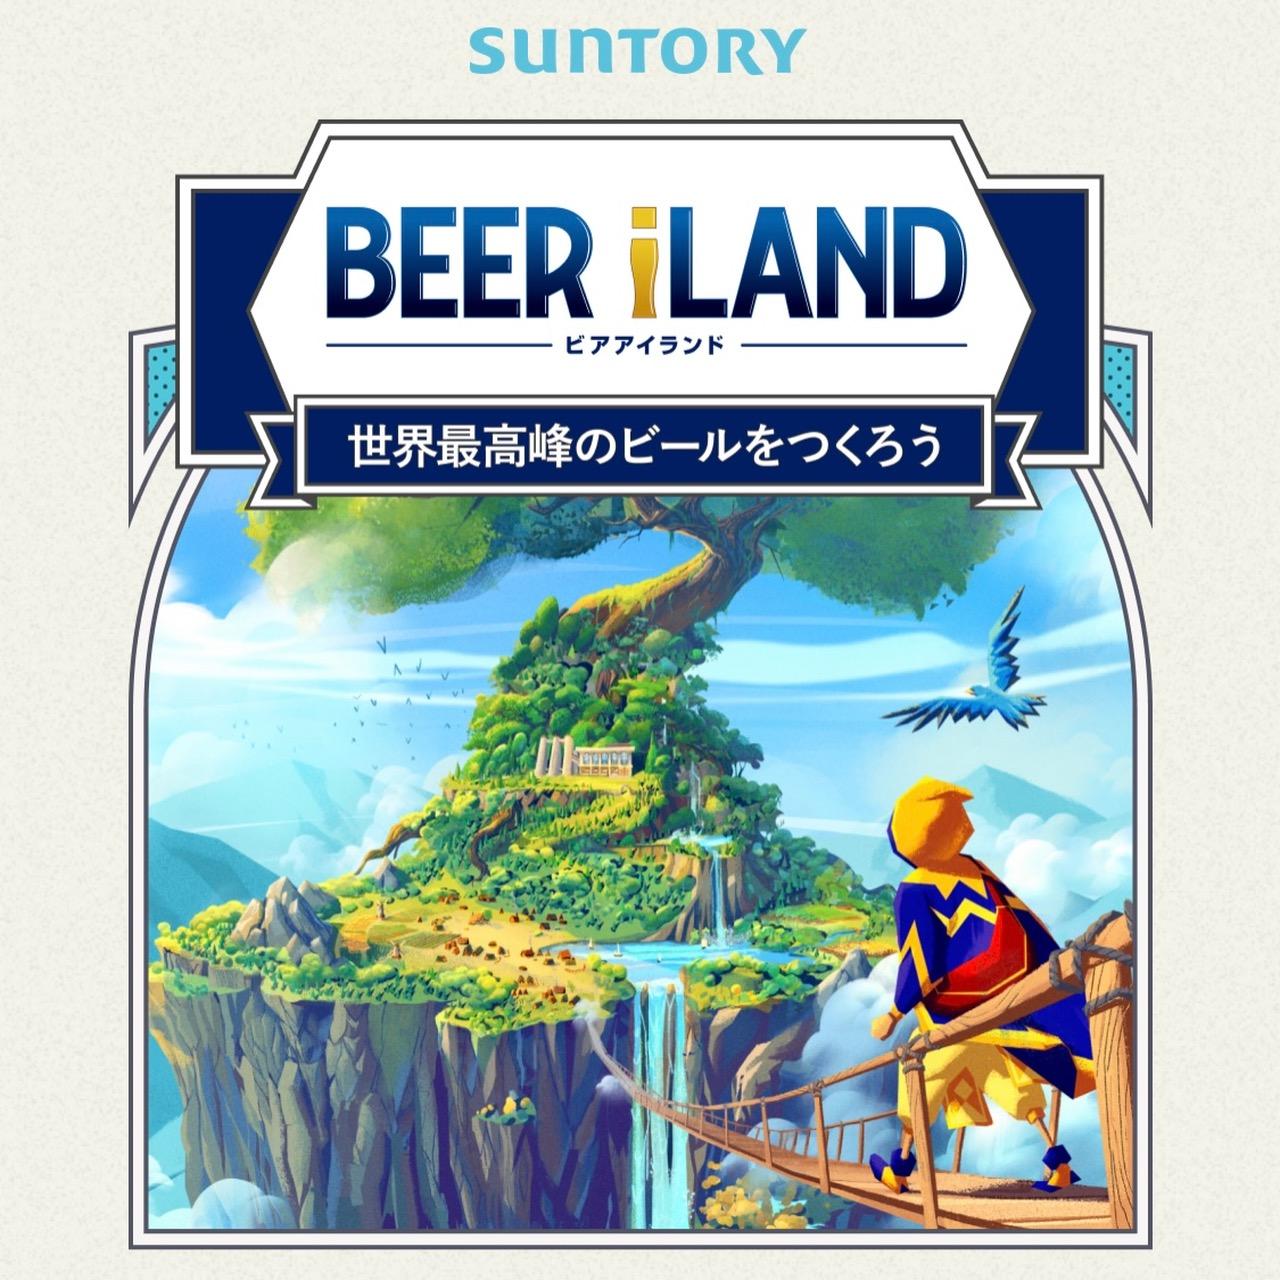 「BEER iLAND」(ビアアイランド)